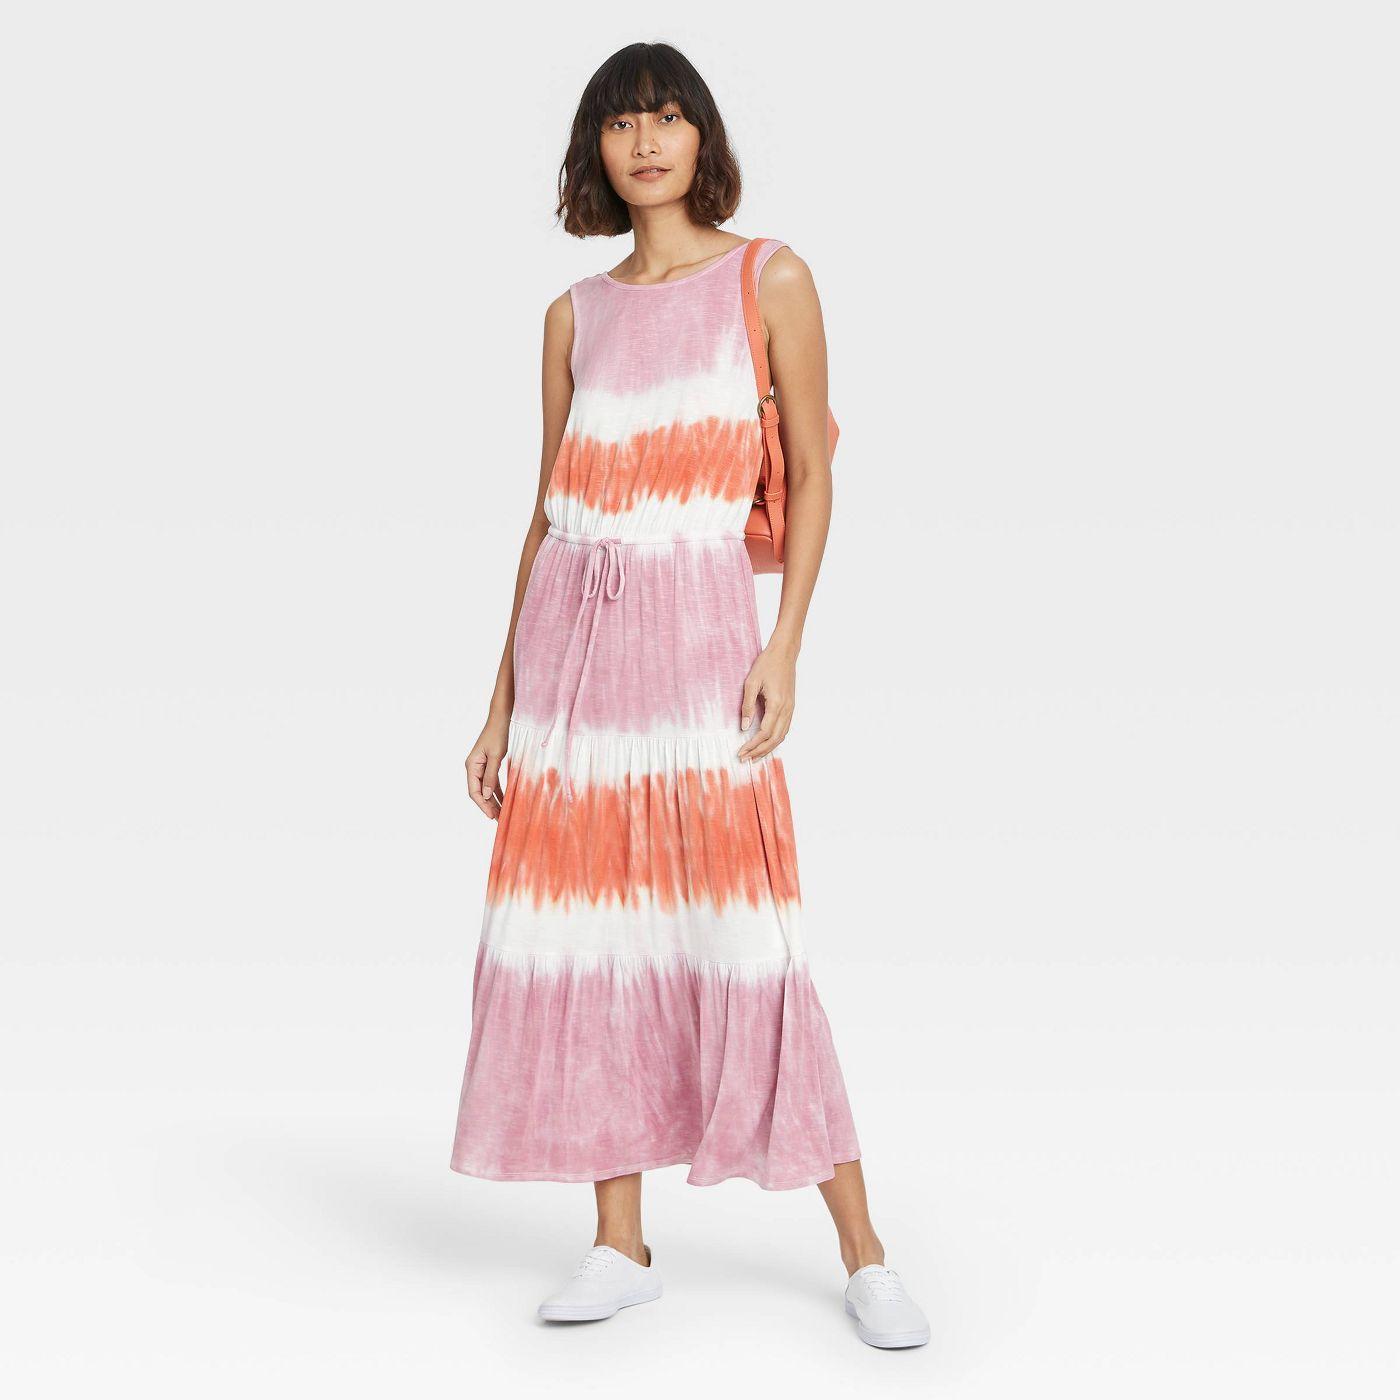 Women's Sleeveless Knit Dress - Knox Rose™ - image 1 of 8